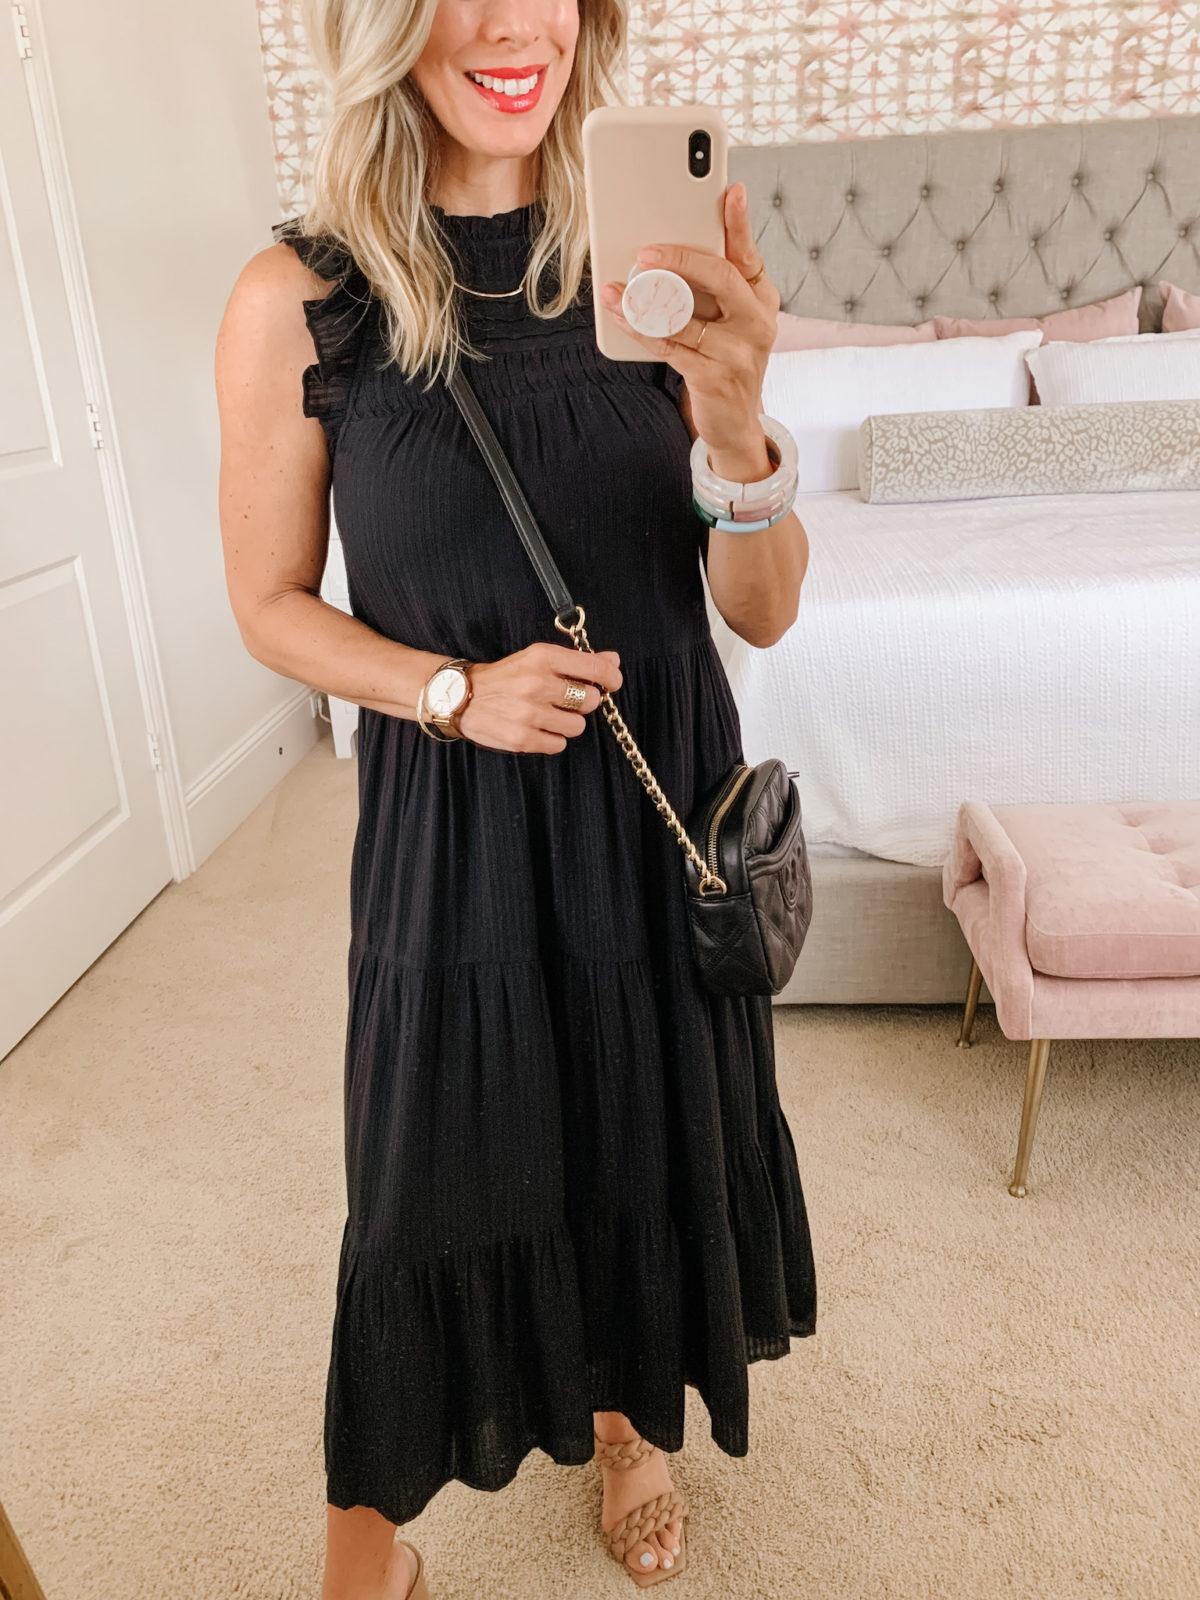 LOFT Black Dress, Sandals, Crossbody